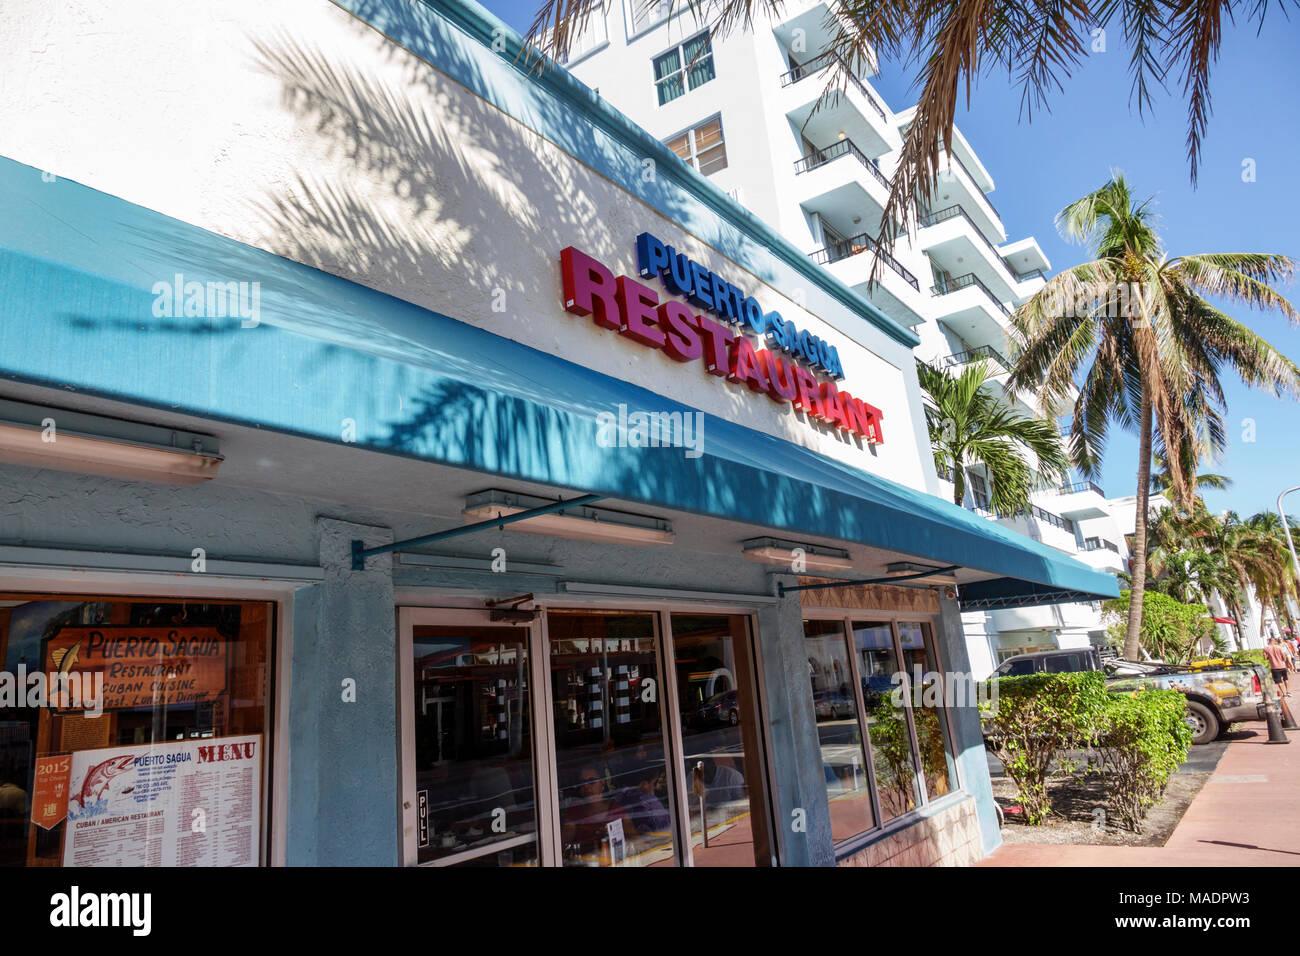 Miami Beach Florida South Beach Collins Avenue Puerto Sagua